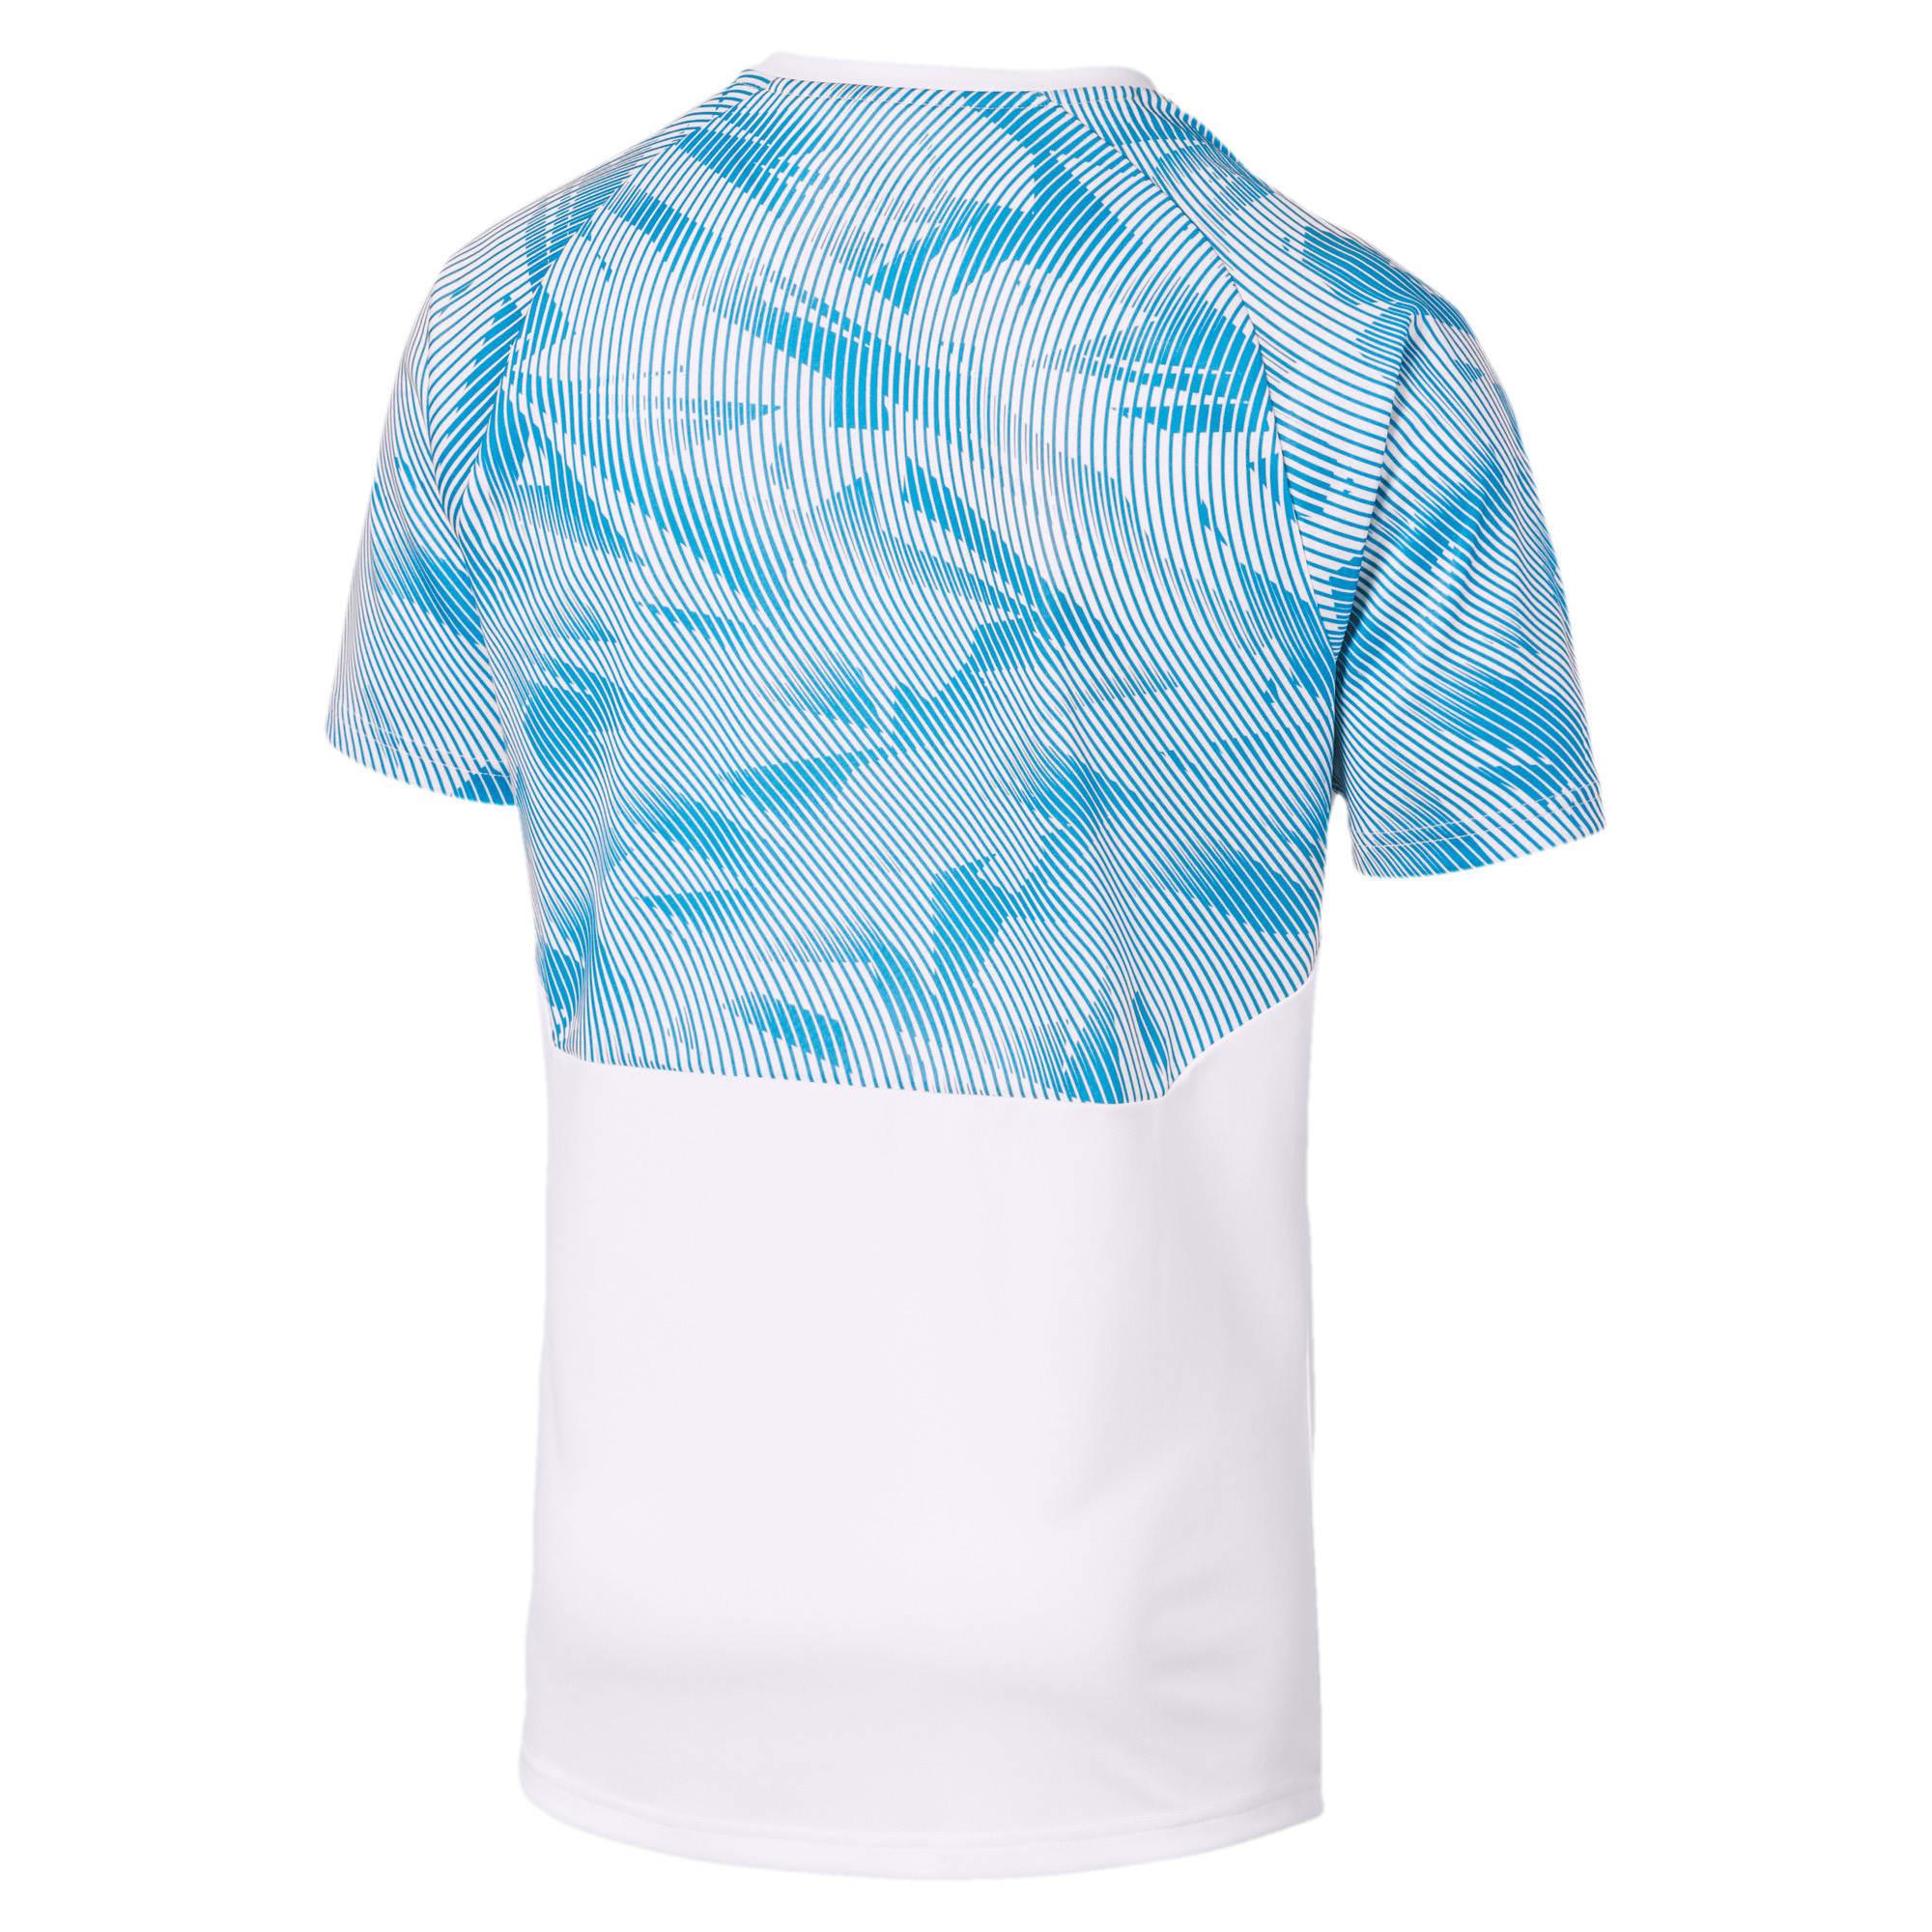 Thumbnail 5 of Olympique de Marseille Men's Training Jersey, Puma White-Bleu Azur, medium